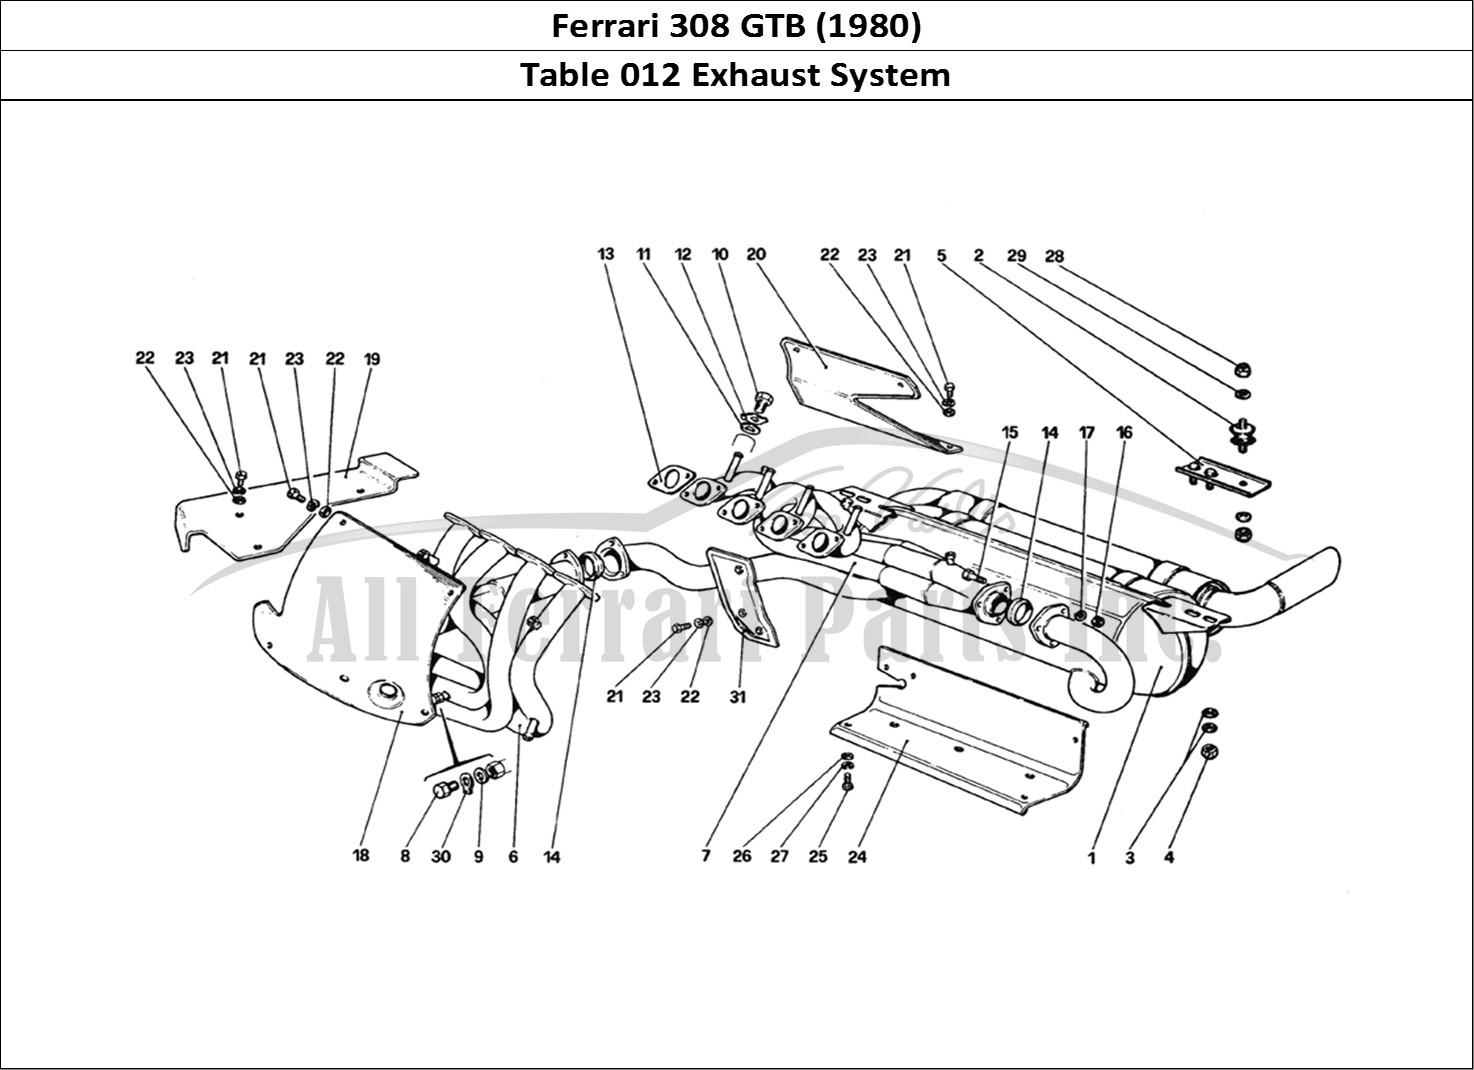 Buy original Ferrari 308 GTB (1980) 012 Exhaust System